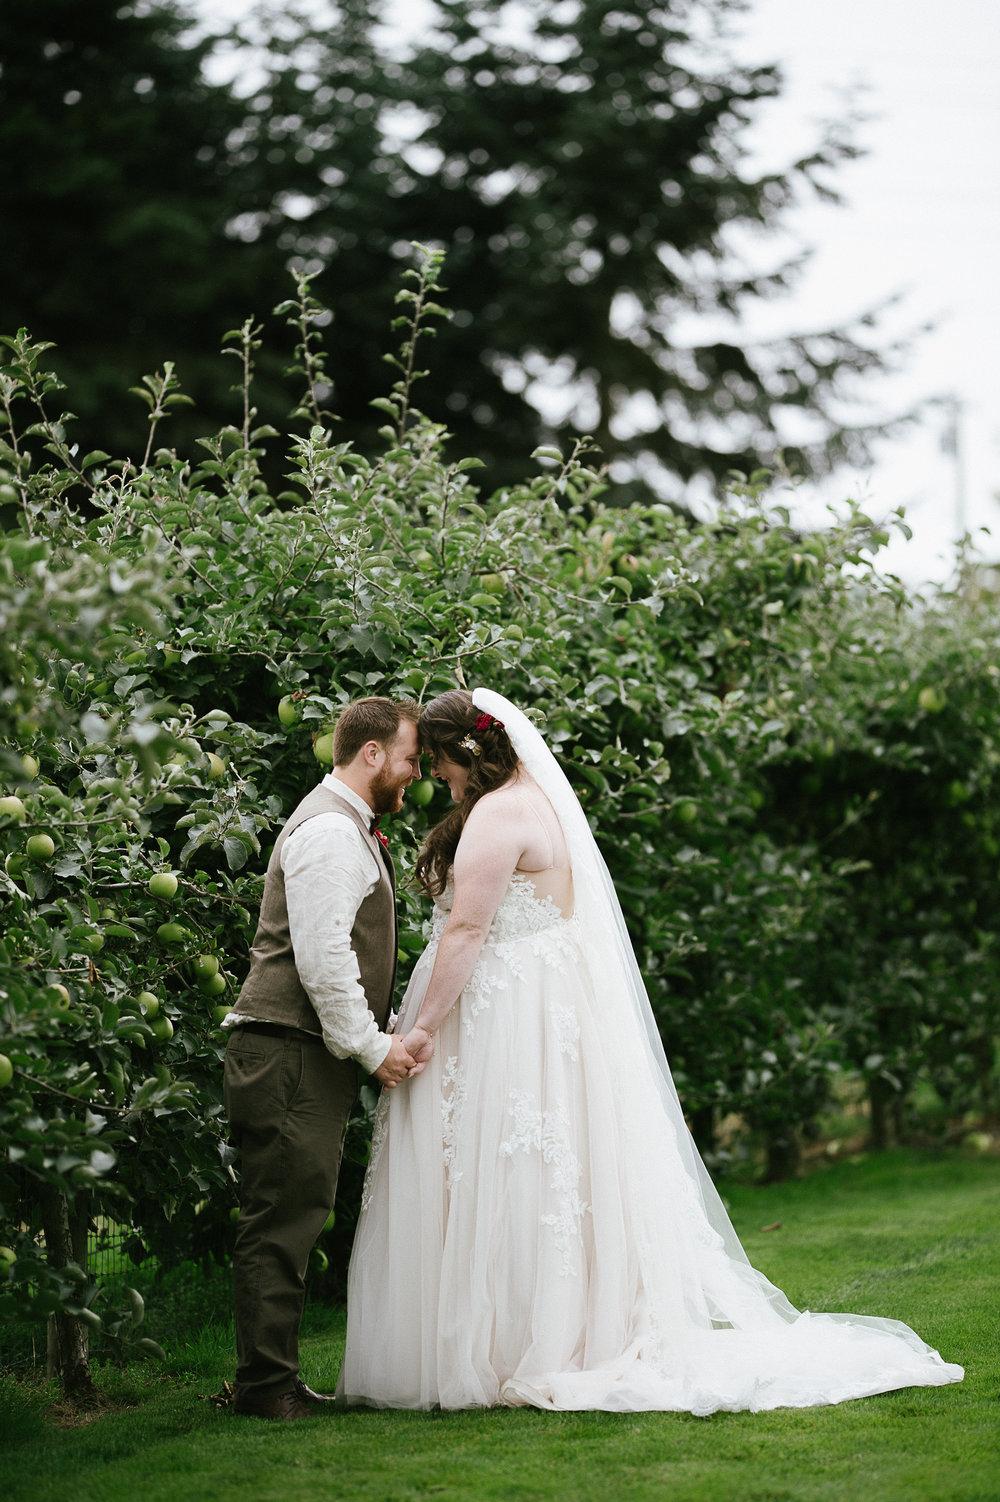 Swan Trail Farm Wedding_Sarah Schurman + Brian Skadan_Snohomish Wedding_Kelsey Lane Photography-5807.jpg